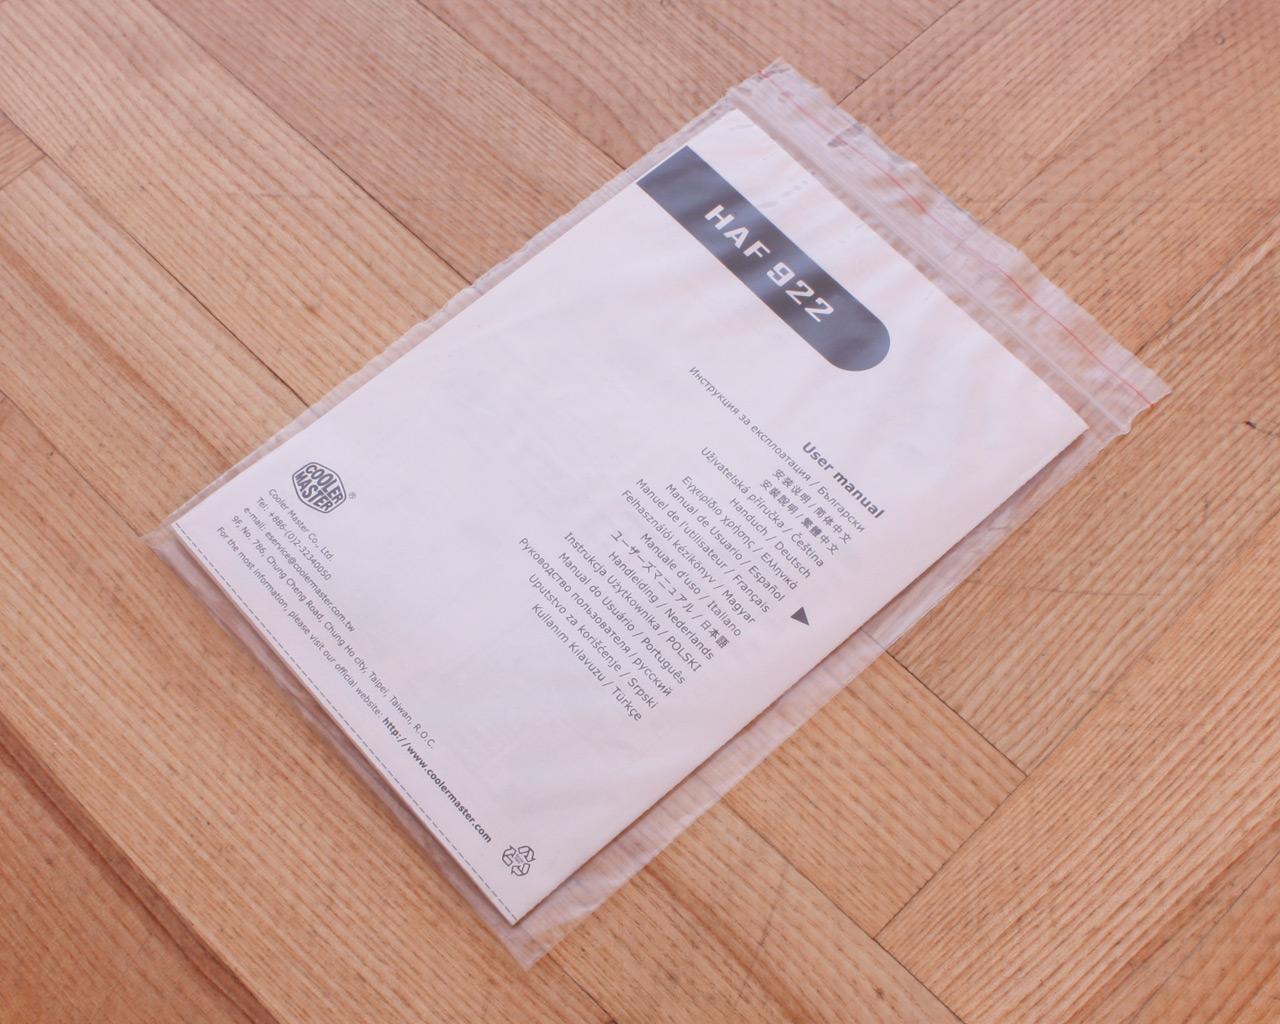 cooler master haf 922 manual